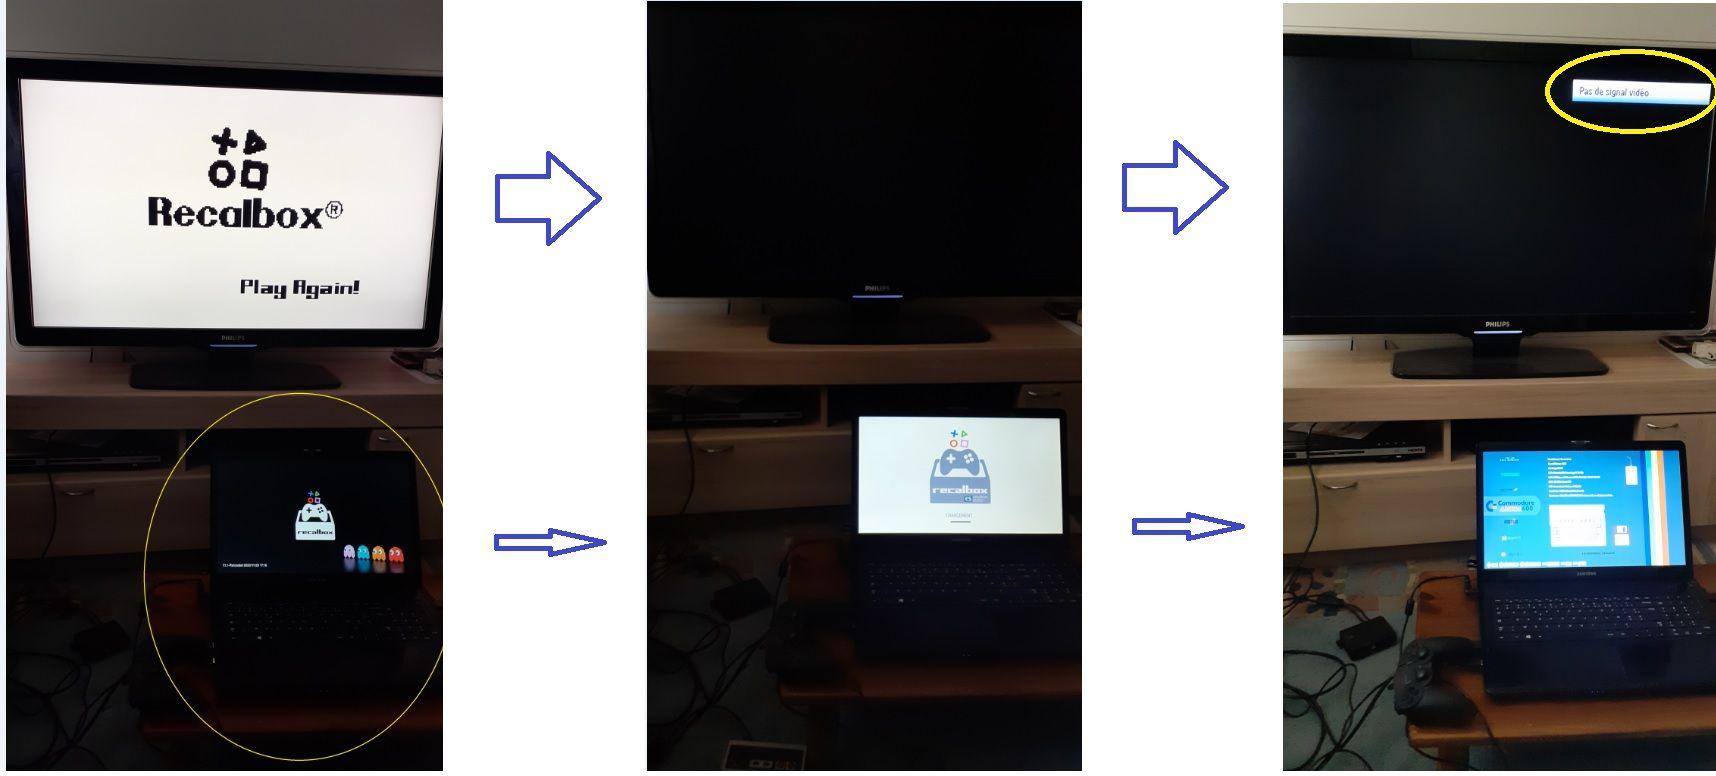 WinSCP-04.jpg